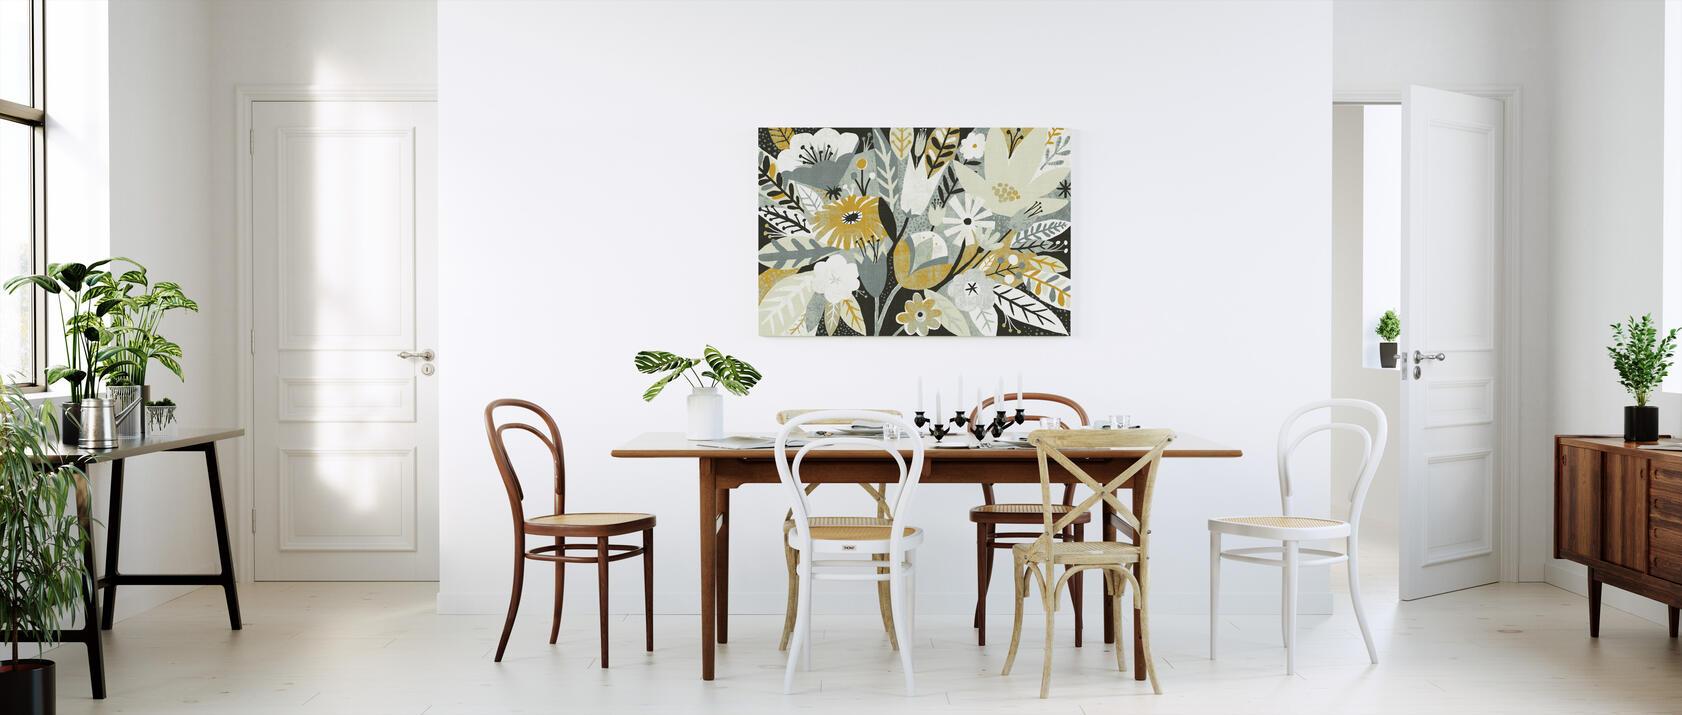 vintage bouquet yellow leinwandbild h chster qualit t. Black Bedroom Furniture Sets. Home Design Ideas